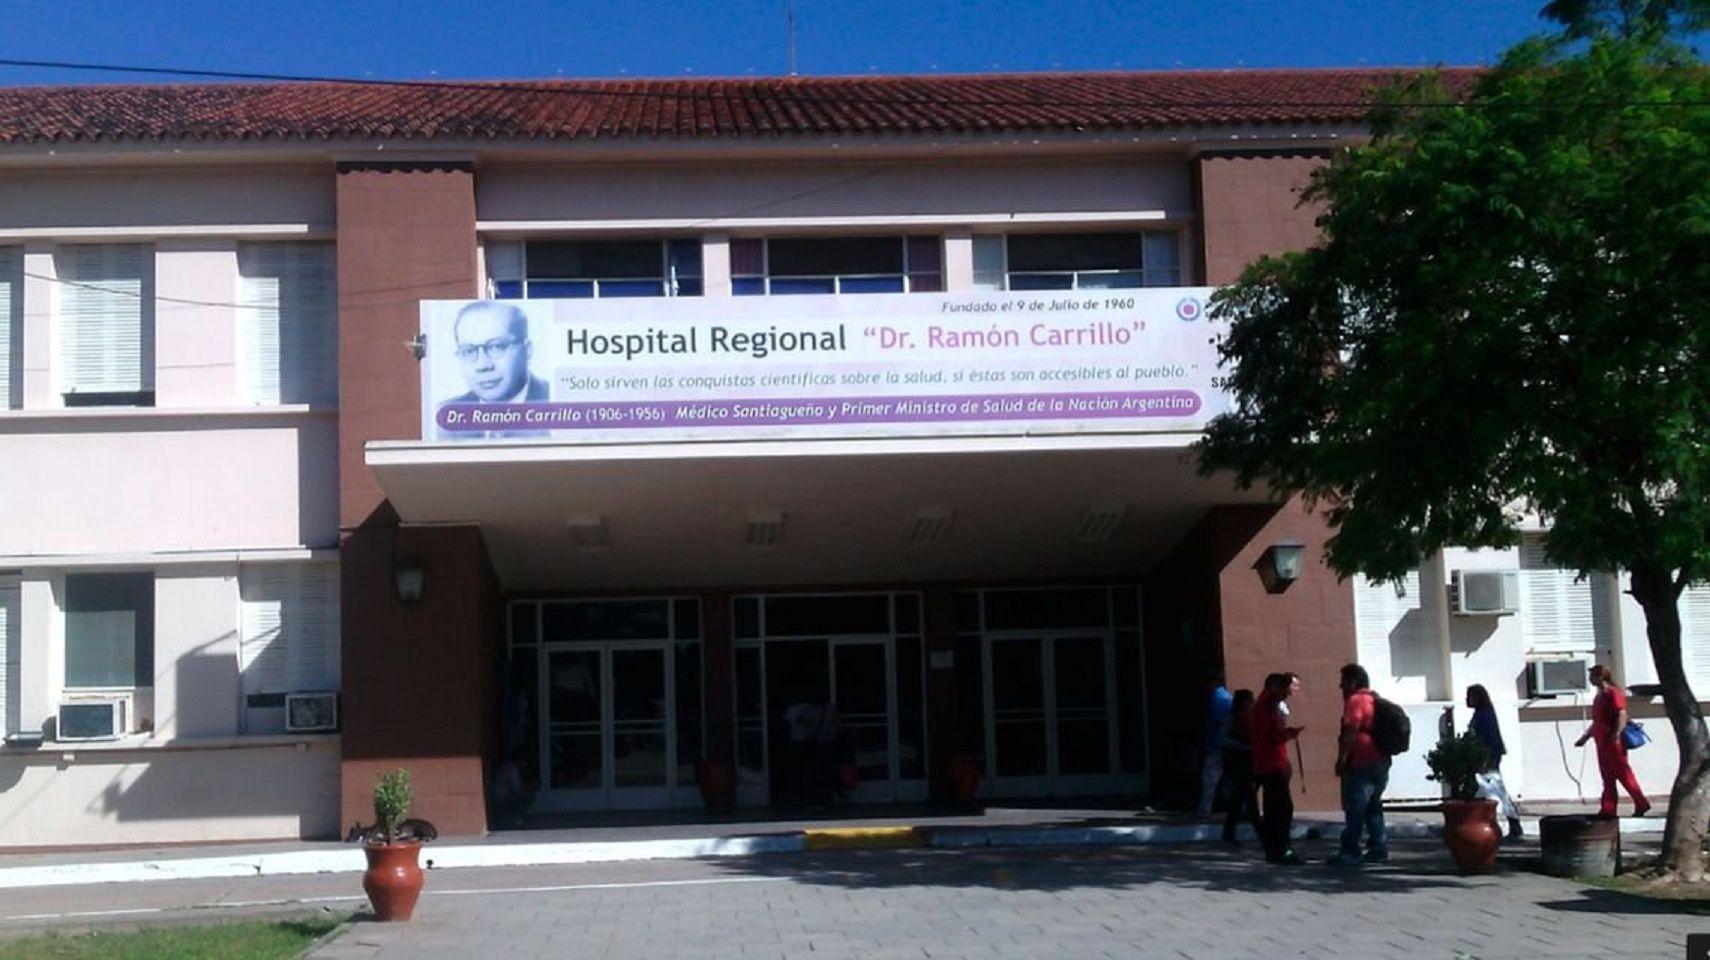 Hospital Regional Ramón Carrillo